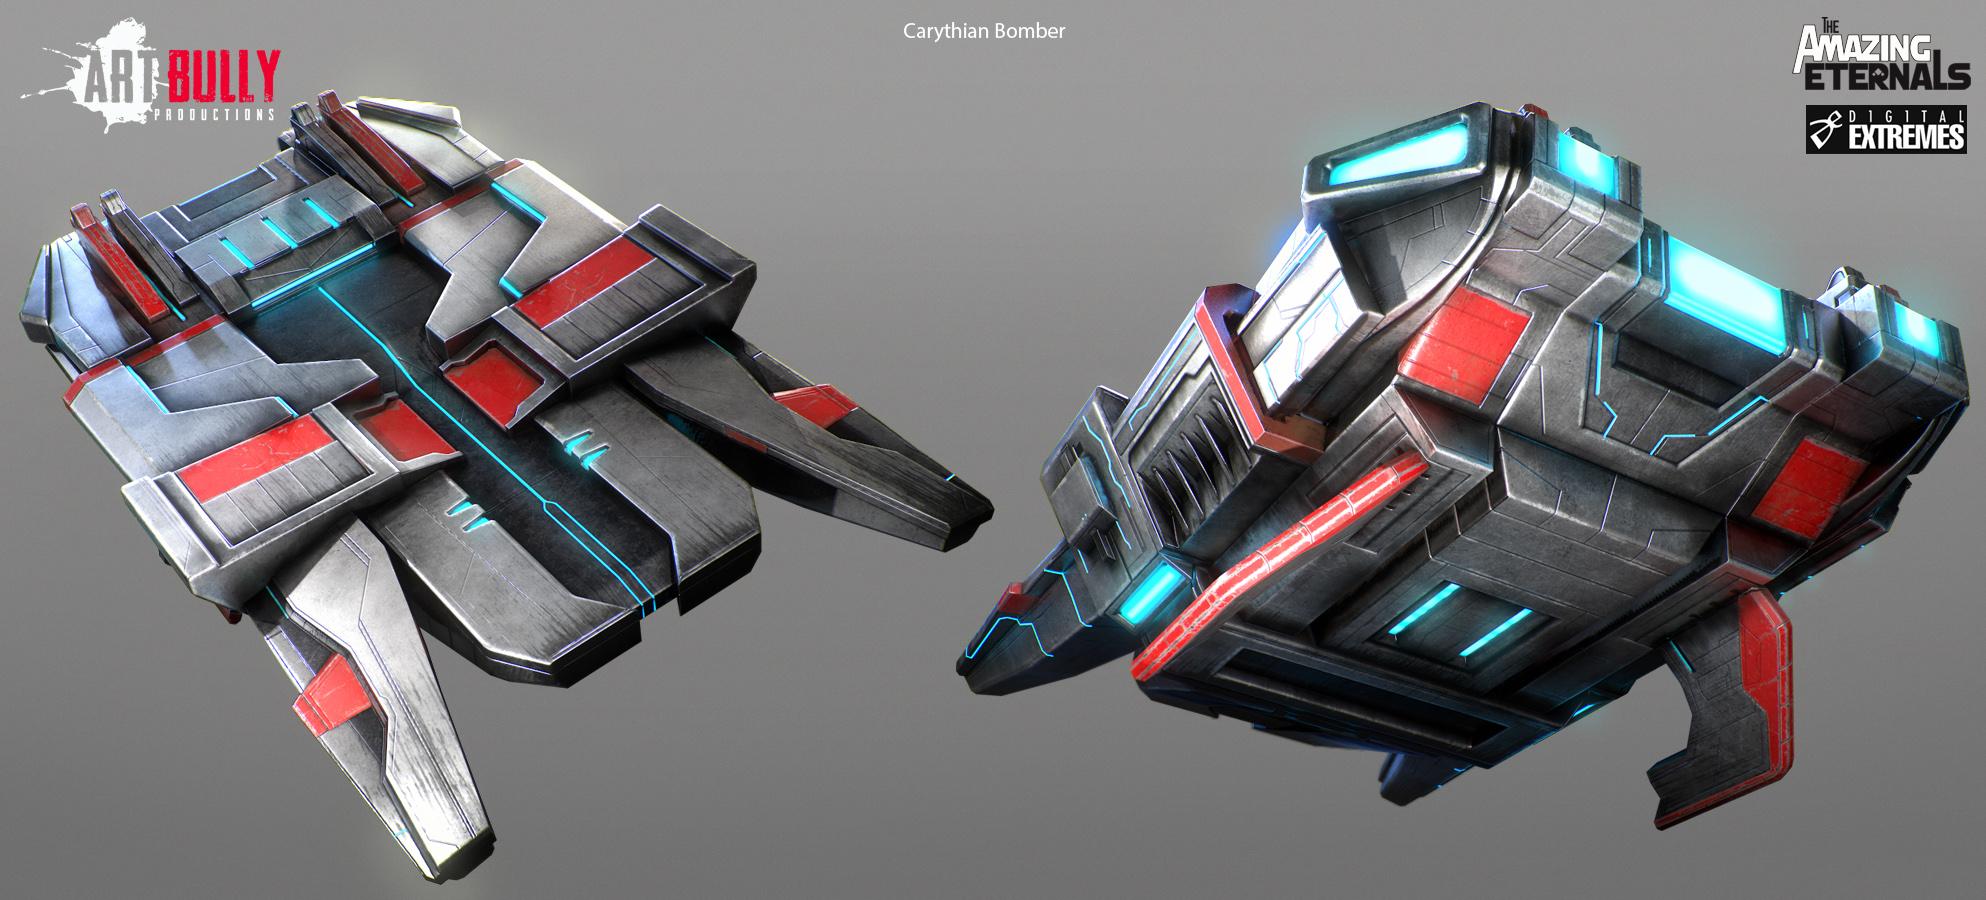 Carythian_Bomber_Renders.jpg